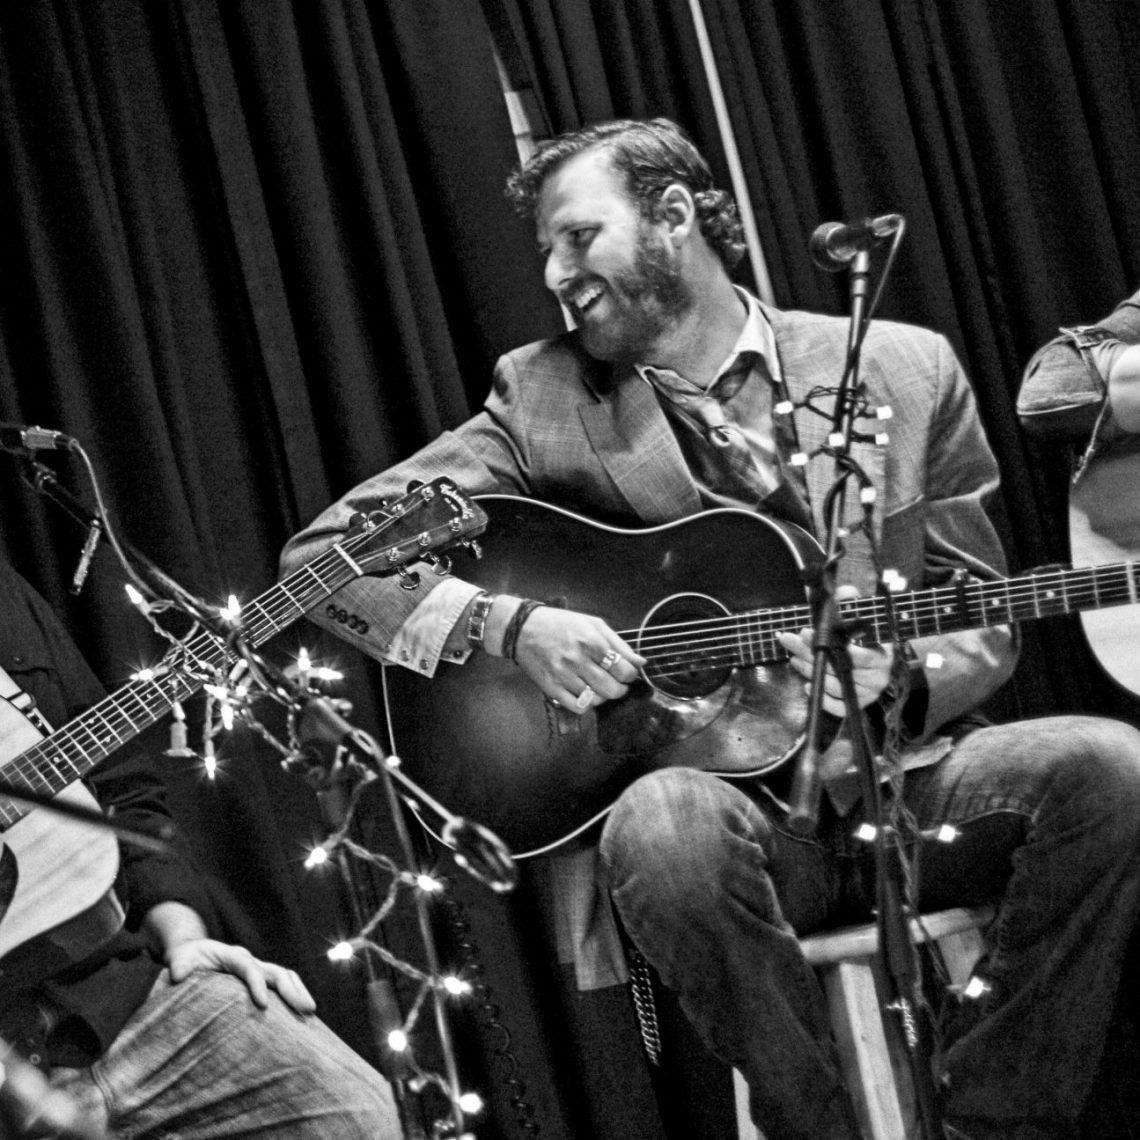 Allan Goodman, Drew Kennedy and Javi Garcia onstage at Tavern in the Gruene in New Braunfels, TX. (Photo by Steve Circeo)